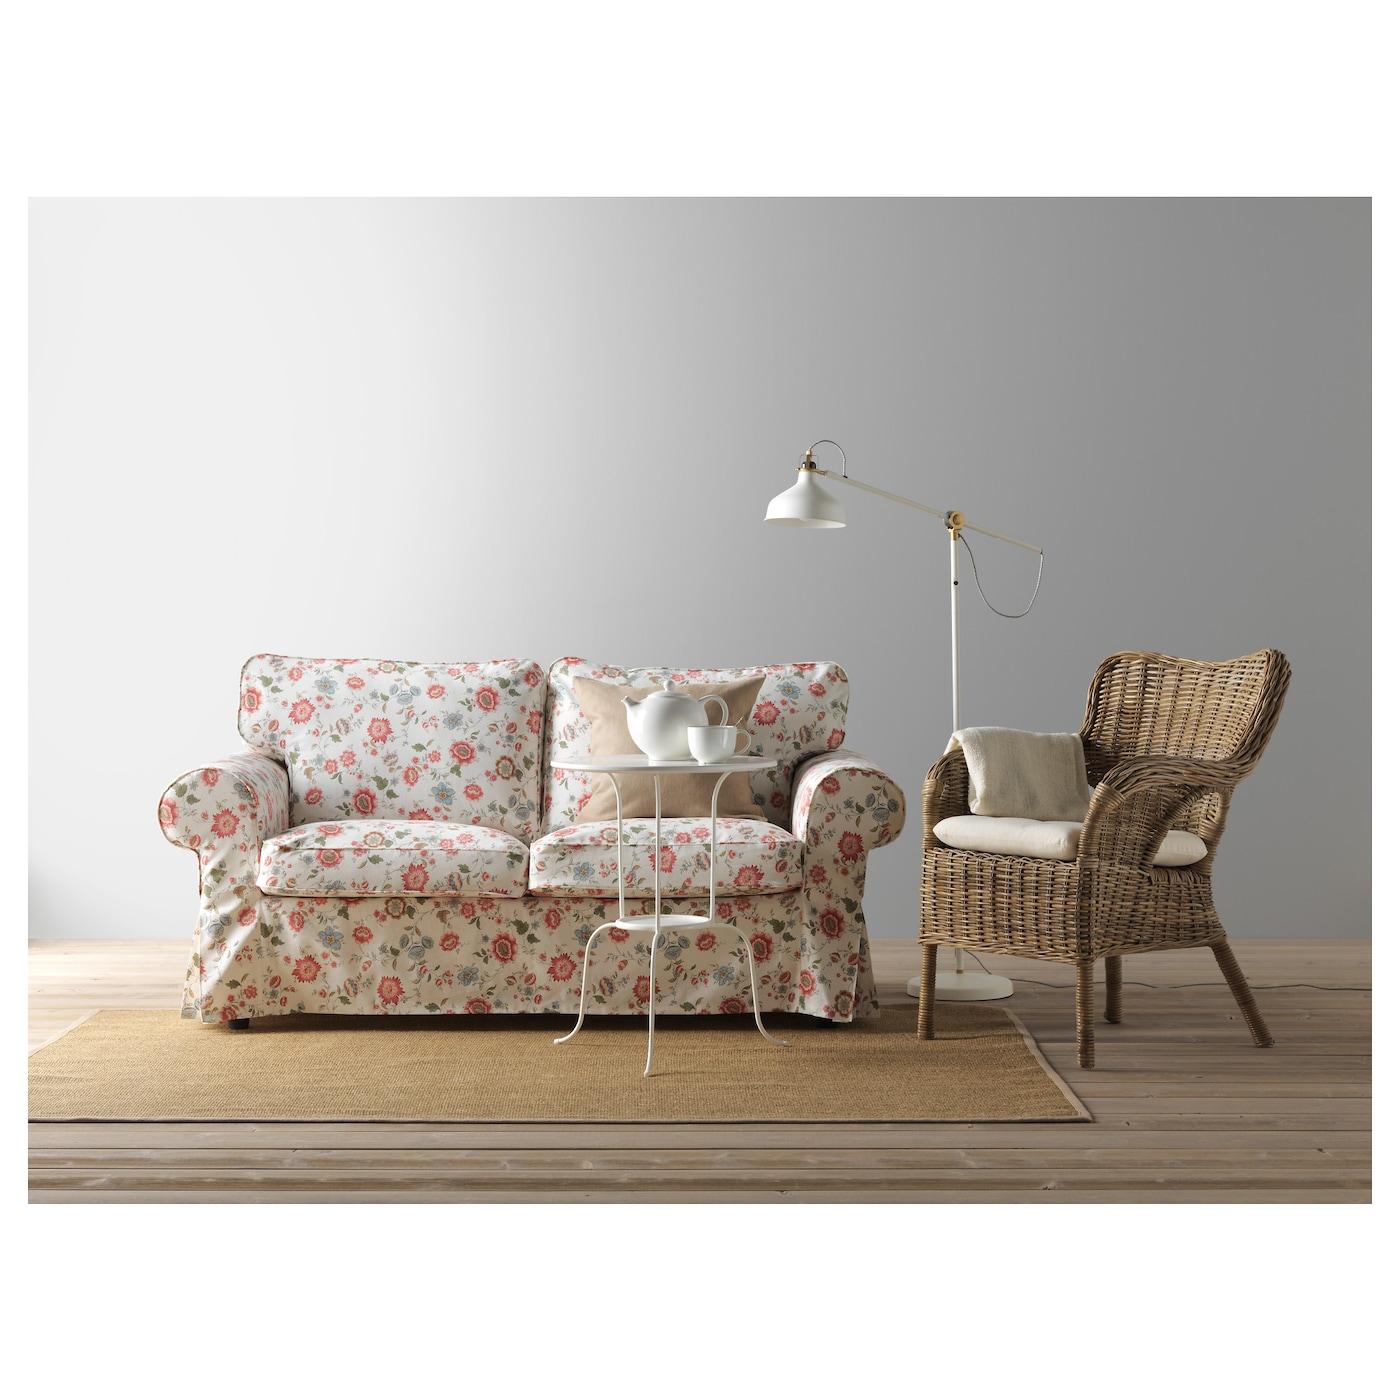 lindved table d 39 appoint blanc 50 x 68 cm ikea. Black Bedroom Furniture Sets. Home Design Ideas